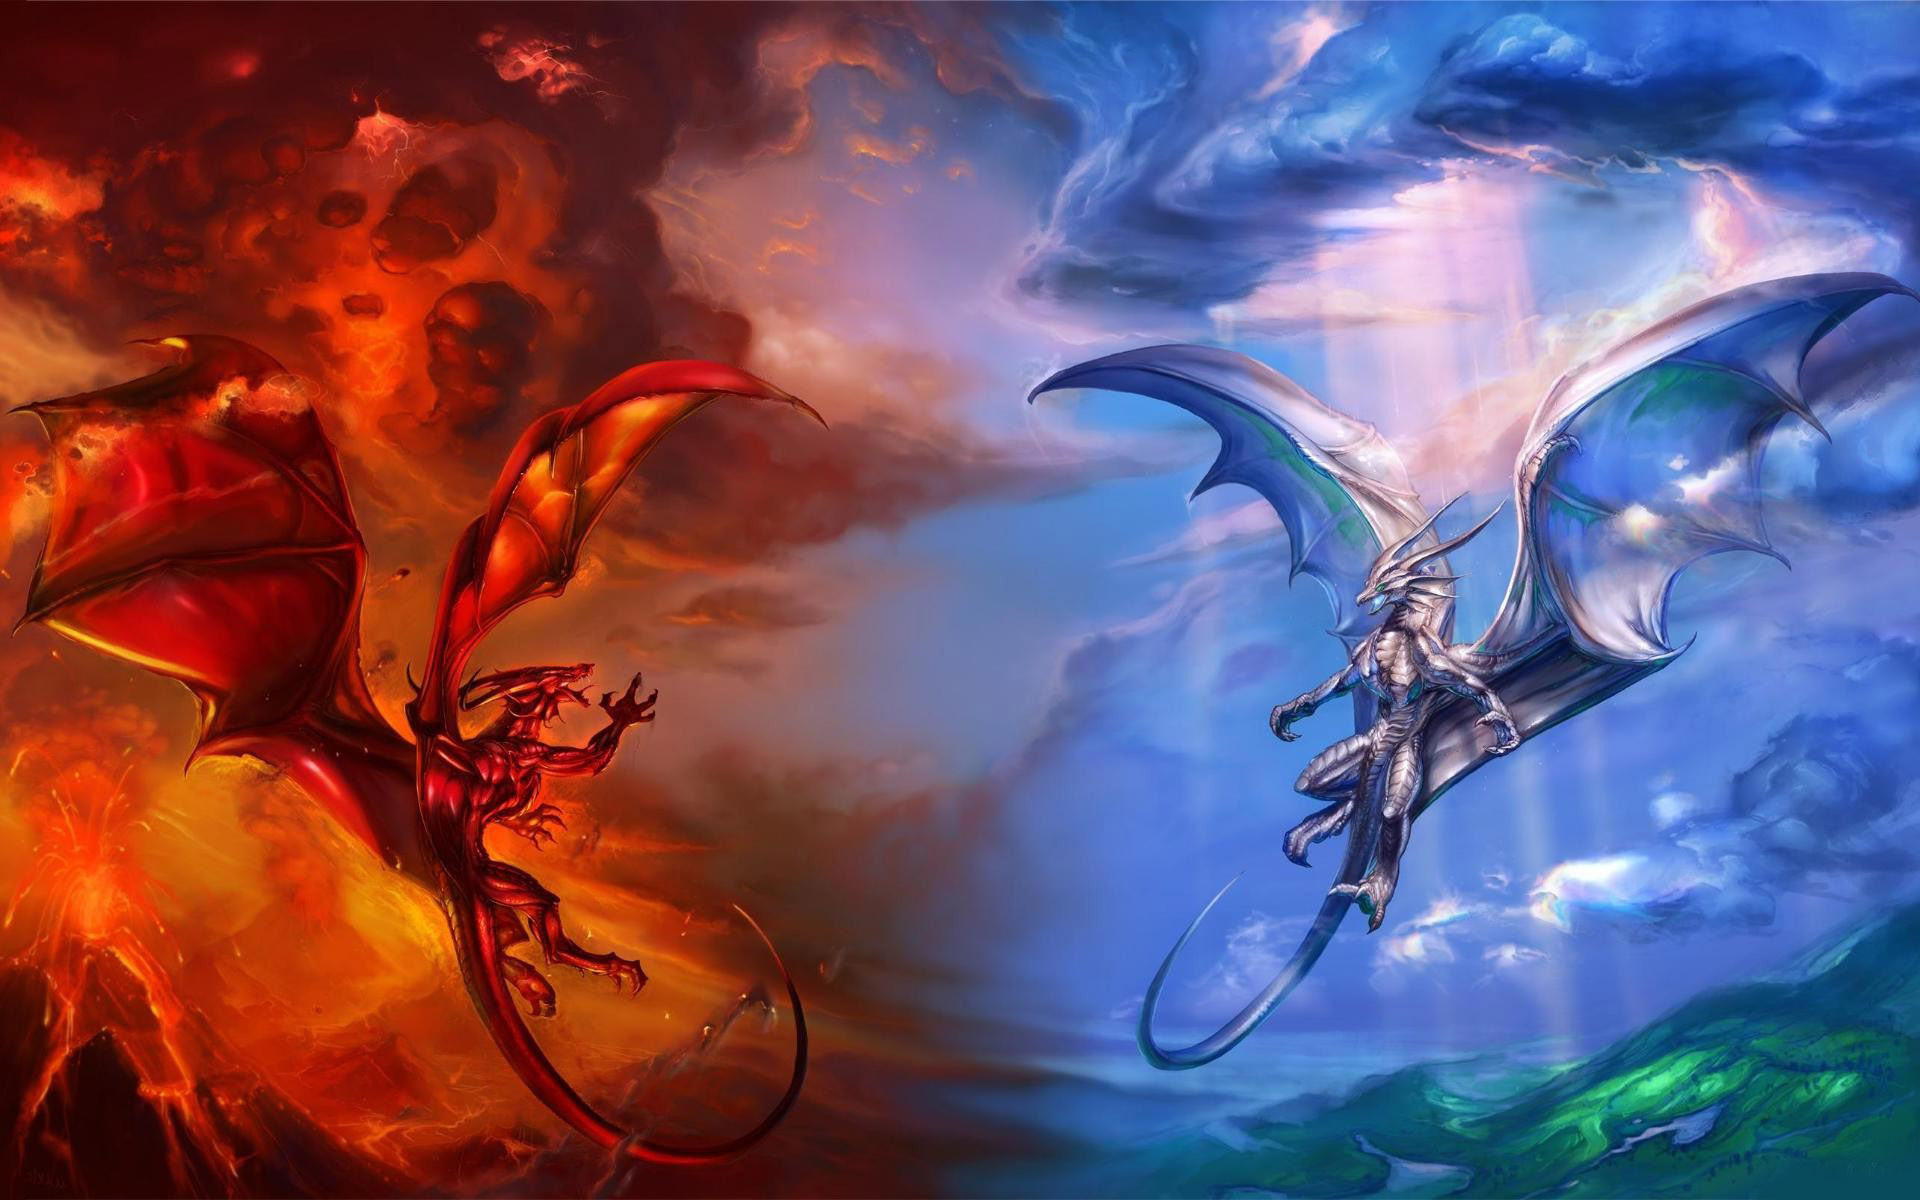 ice dragon vs fire dragon-World of fantasy art design HD wallpaper  Wallpapers View